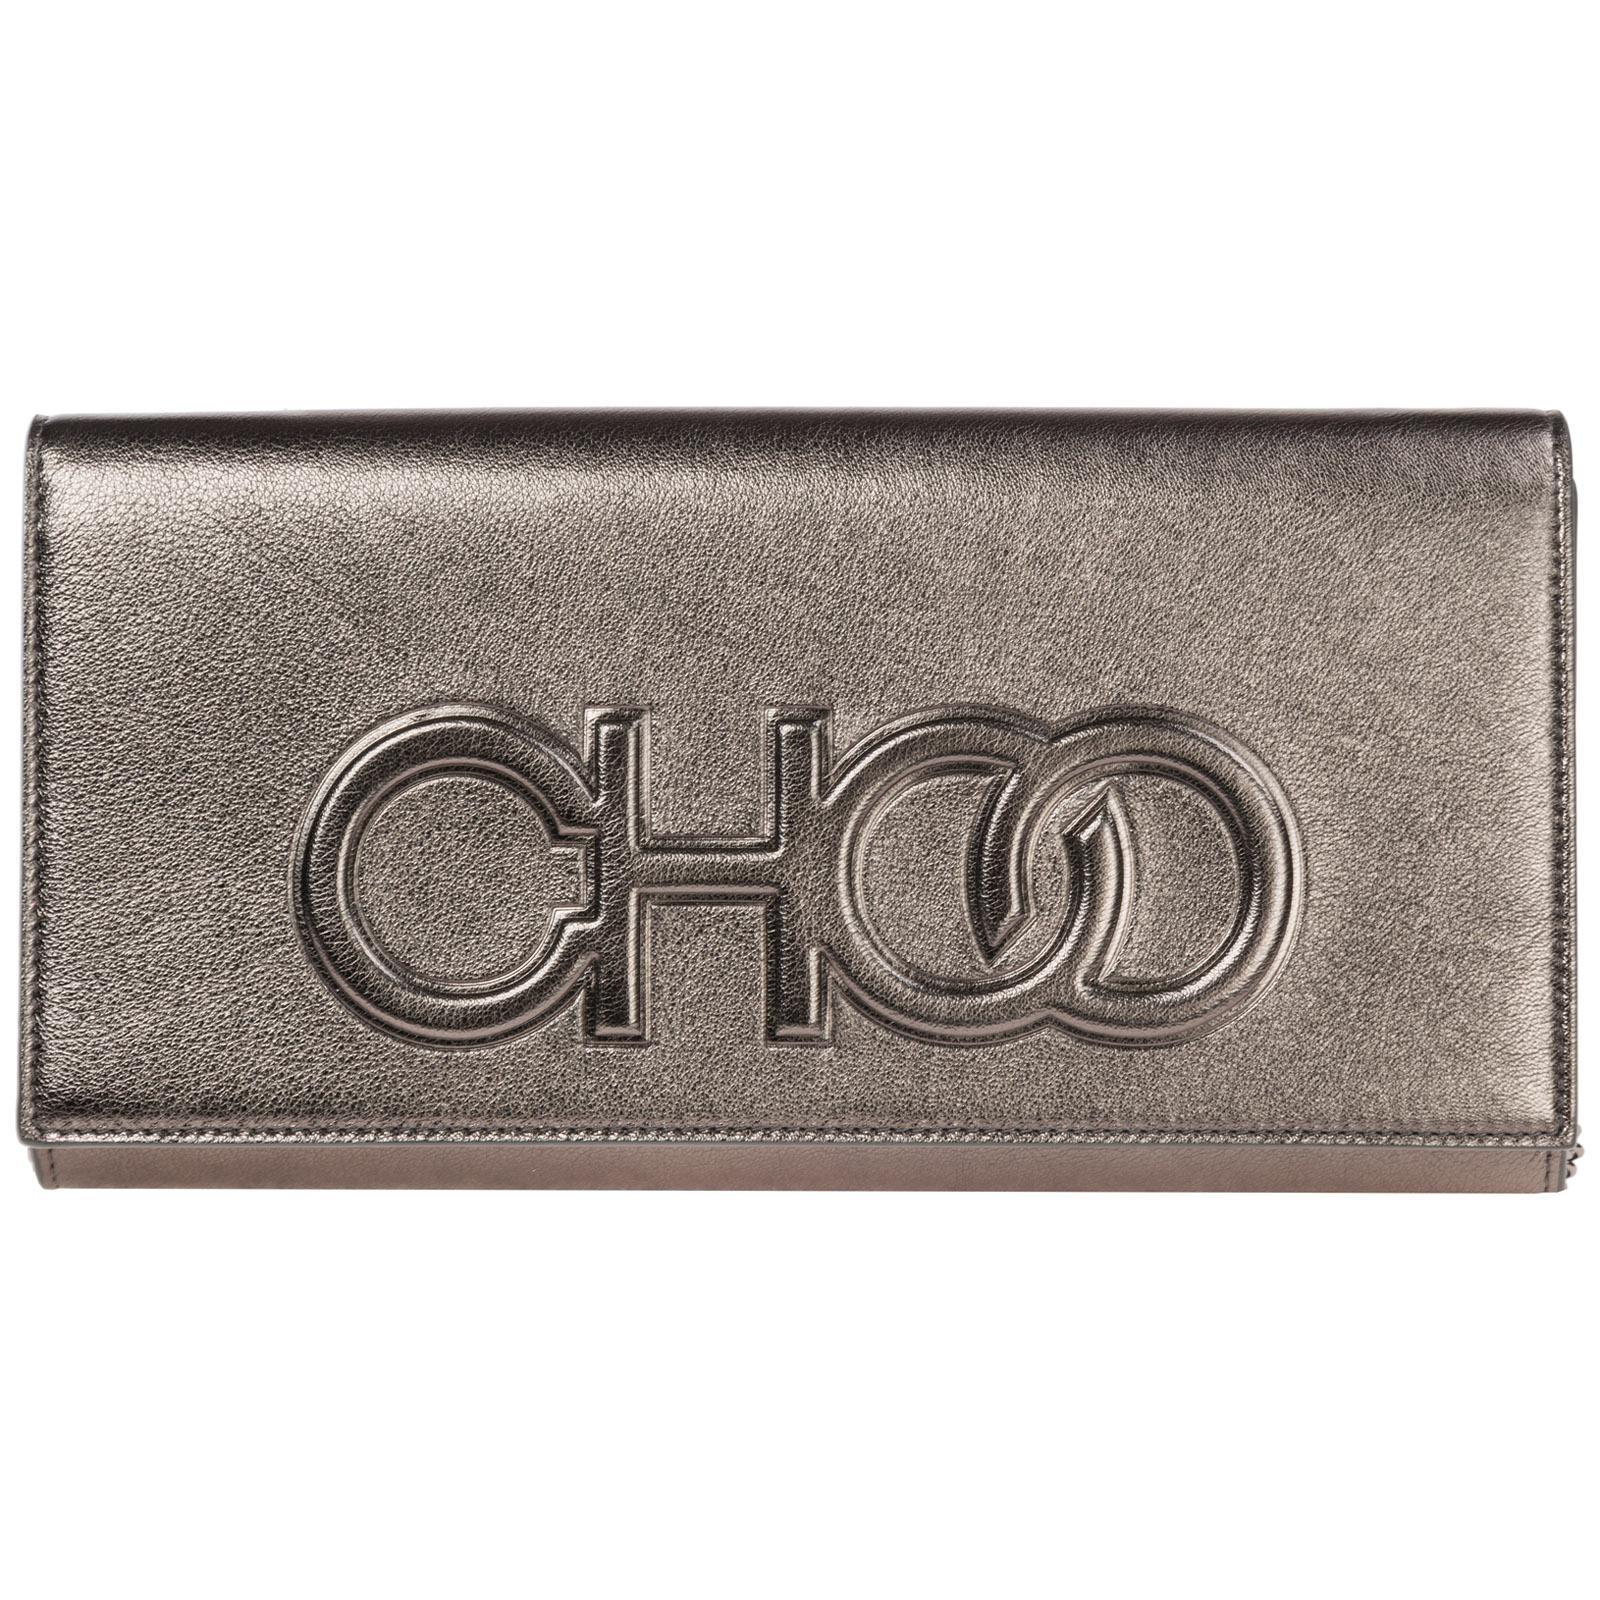 42711d200a Jimmy Choo Leather Clutch With Shoulder Strap Handbag Bag Purse ...